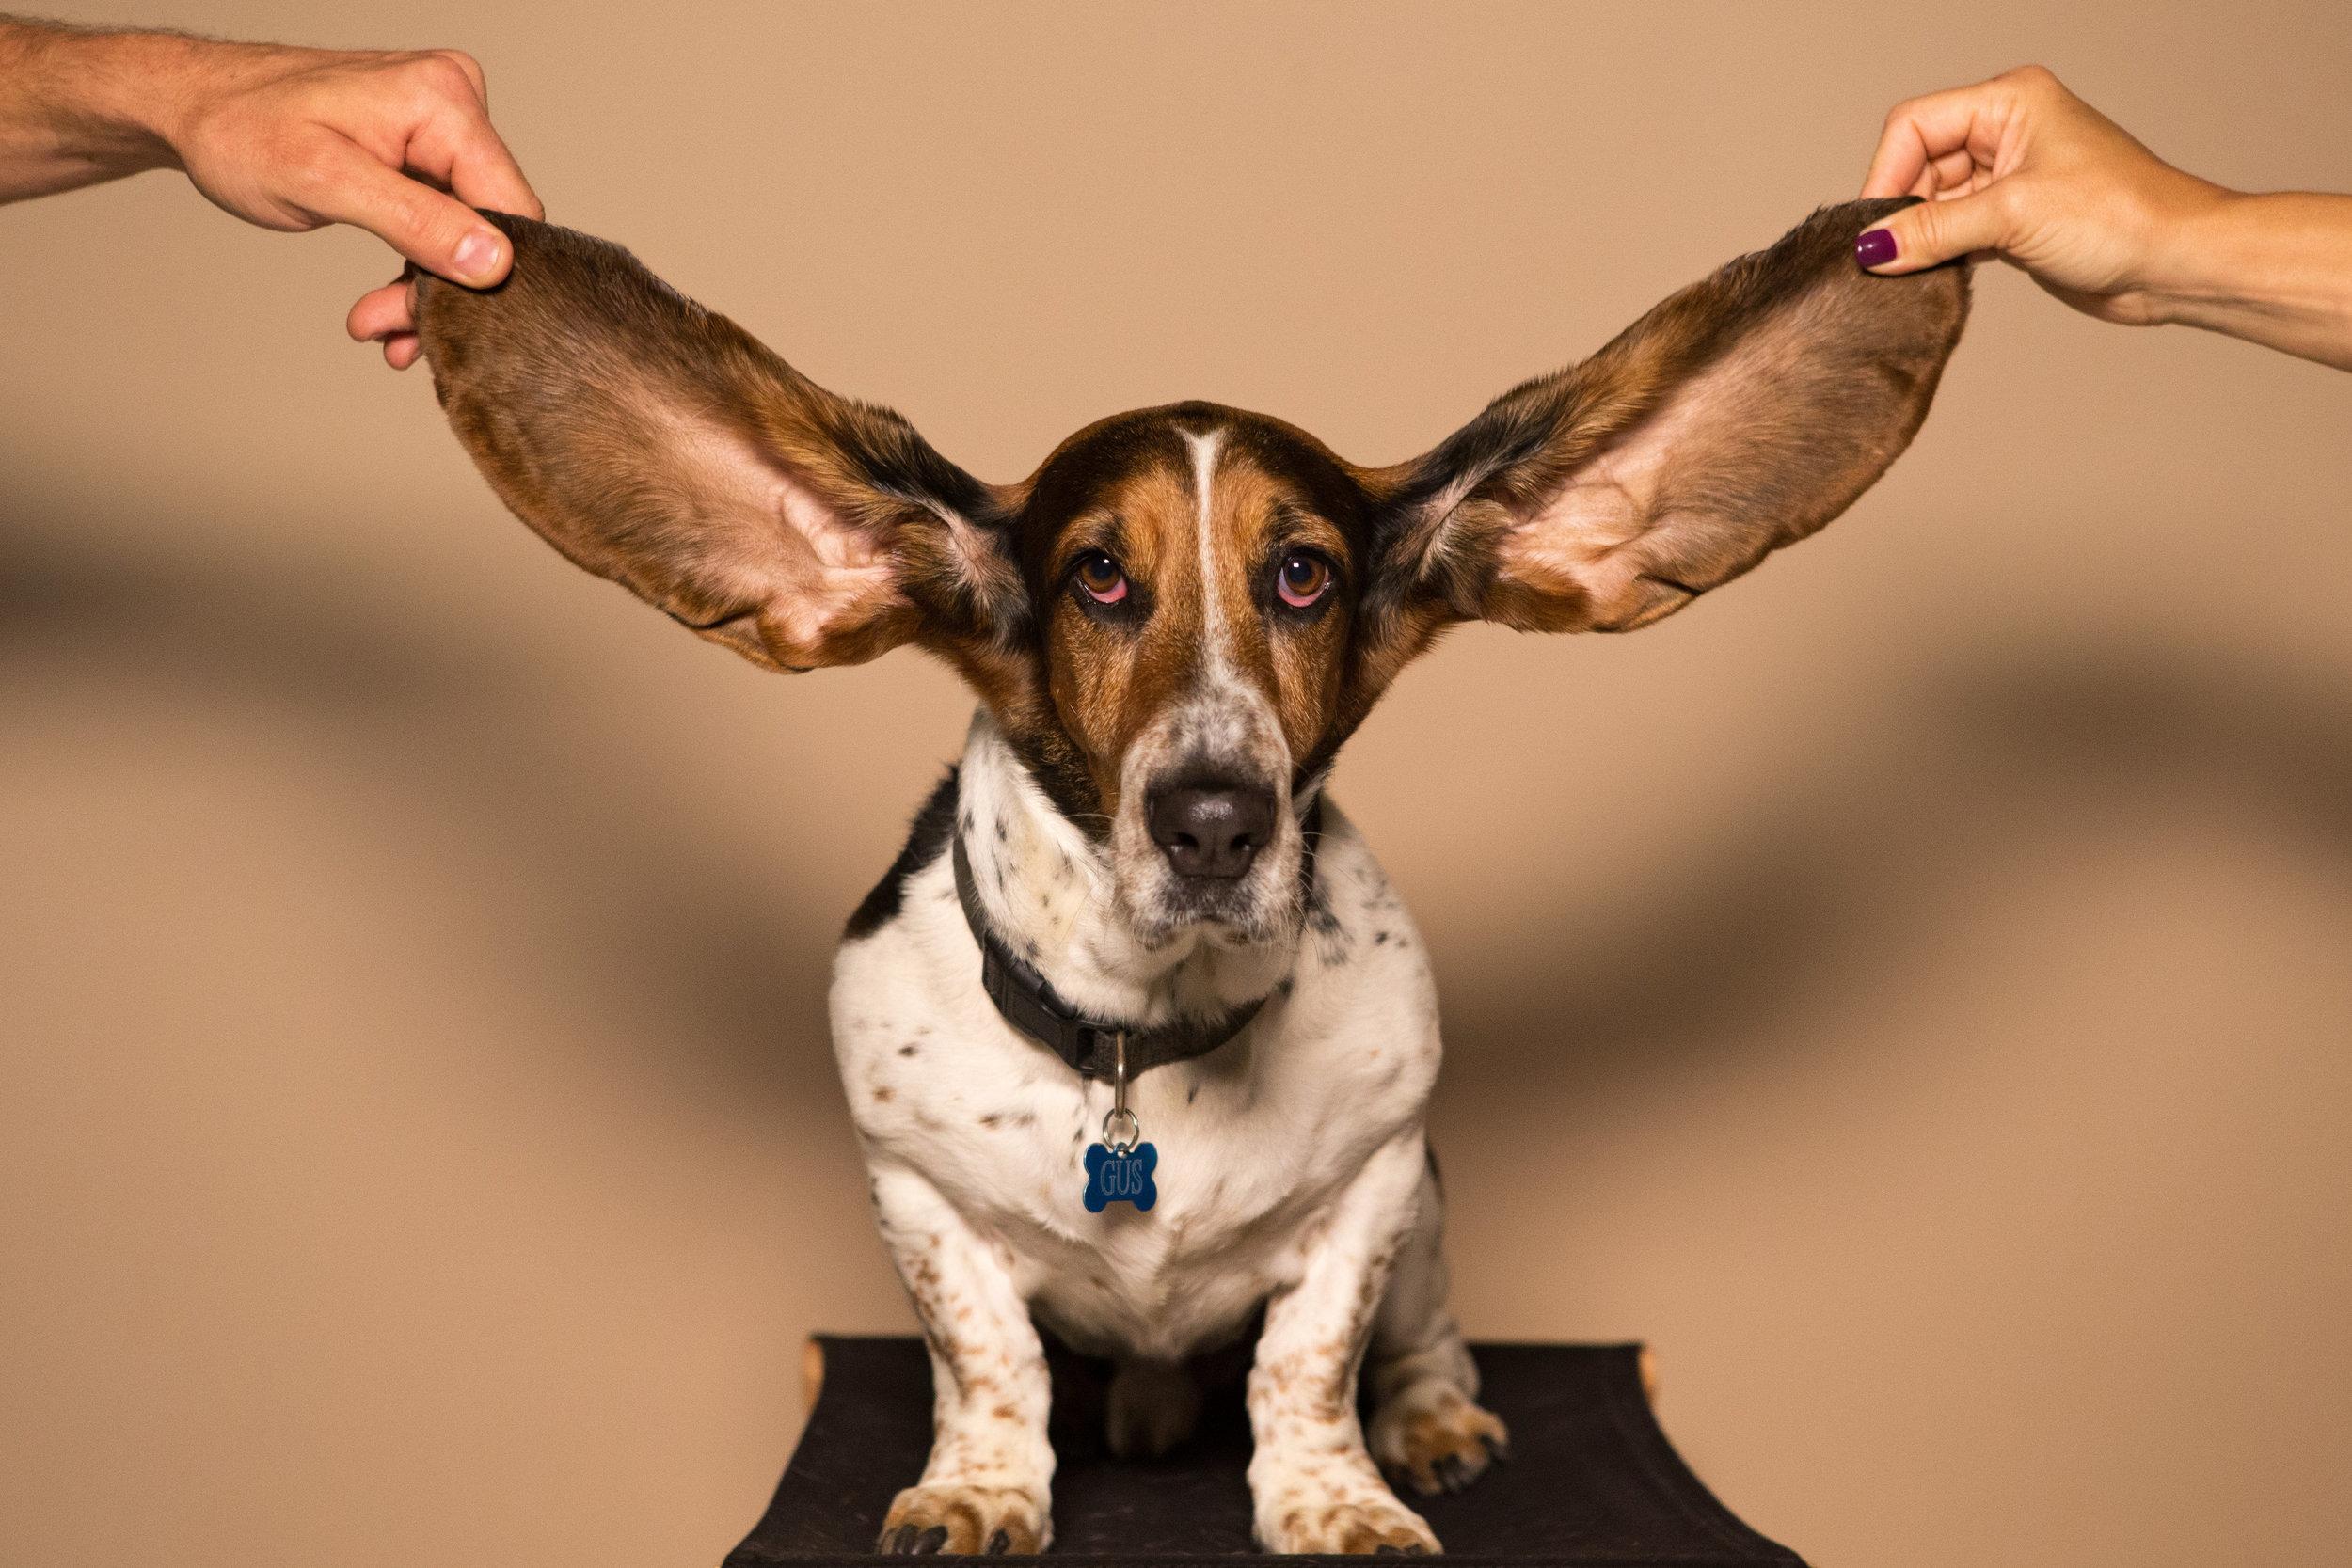 hearingtestdogears